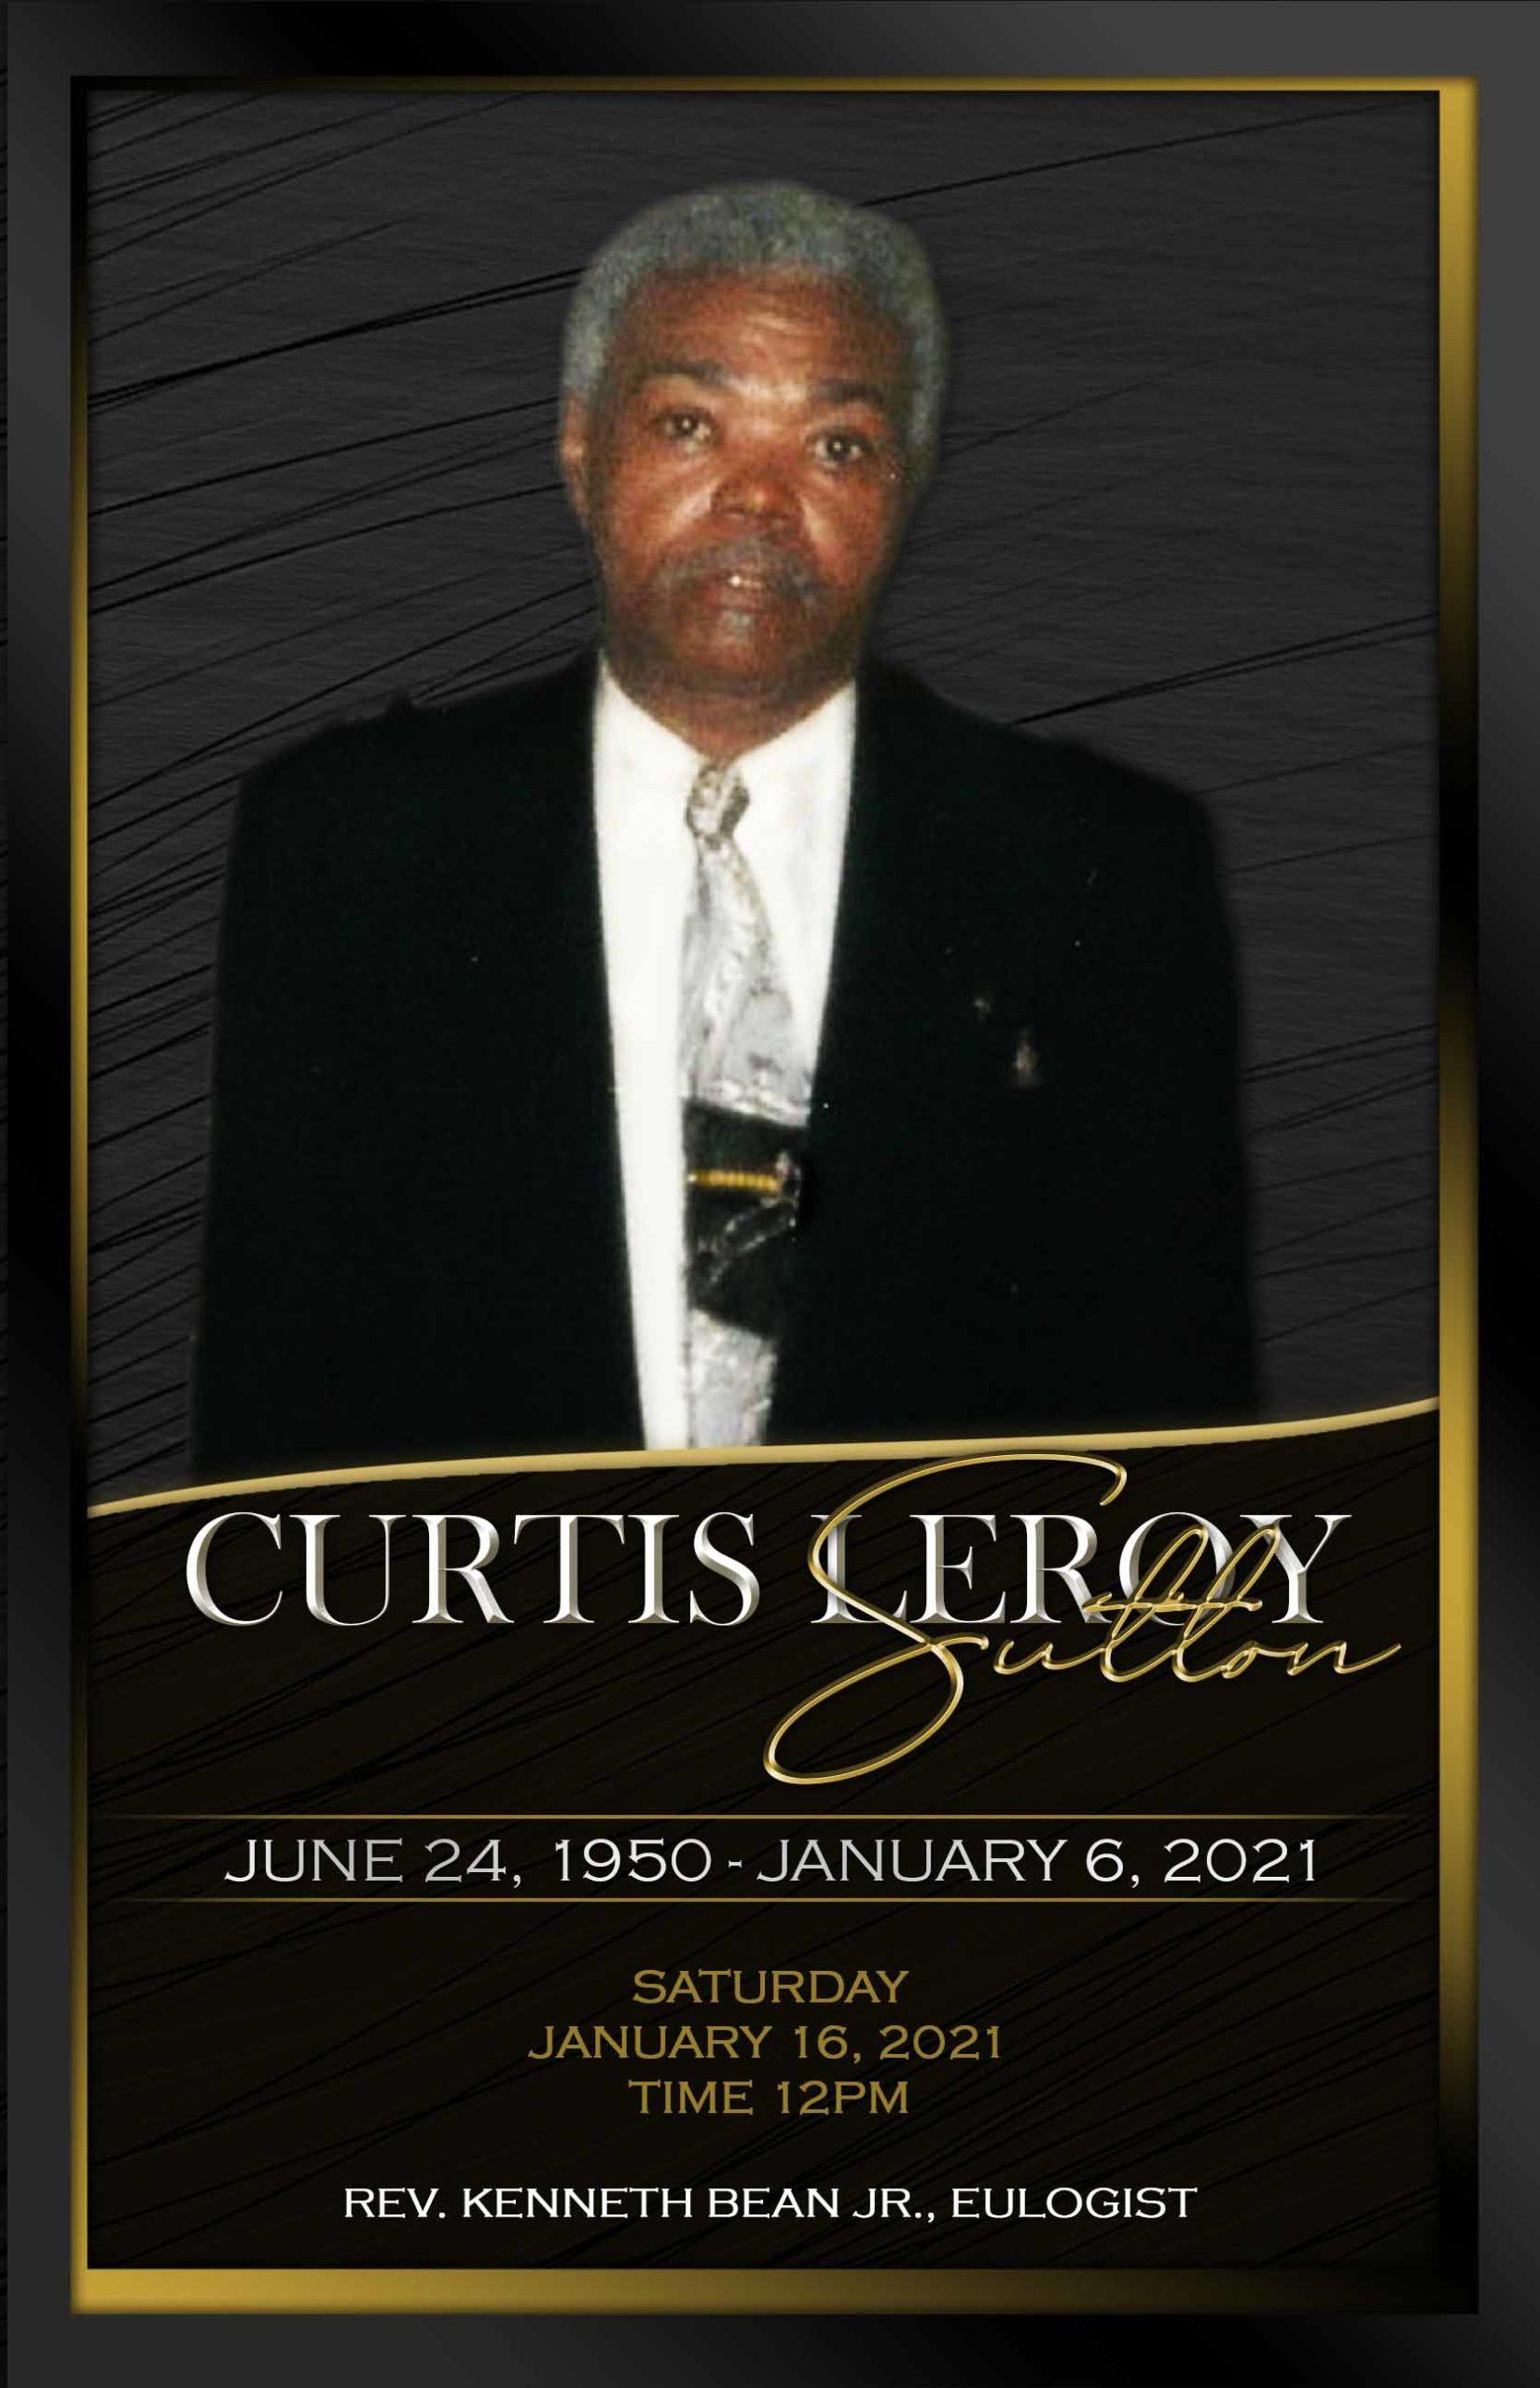 Curtis Leroy Sutton 1950-2021